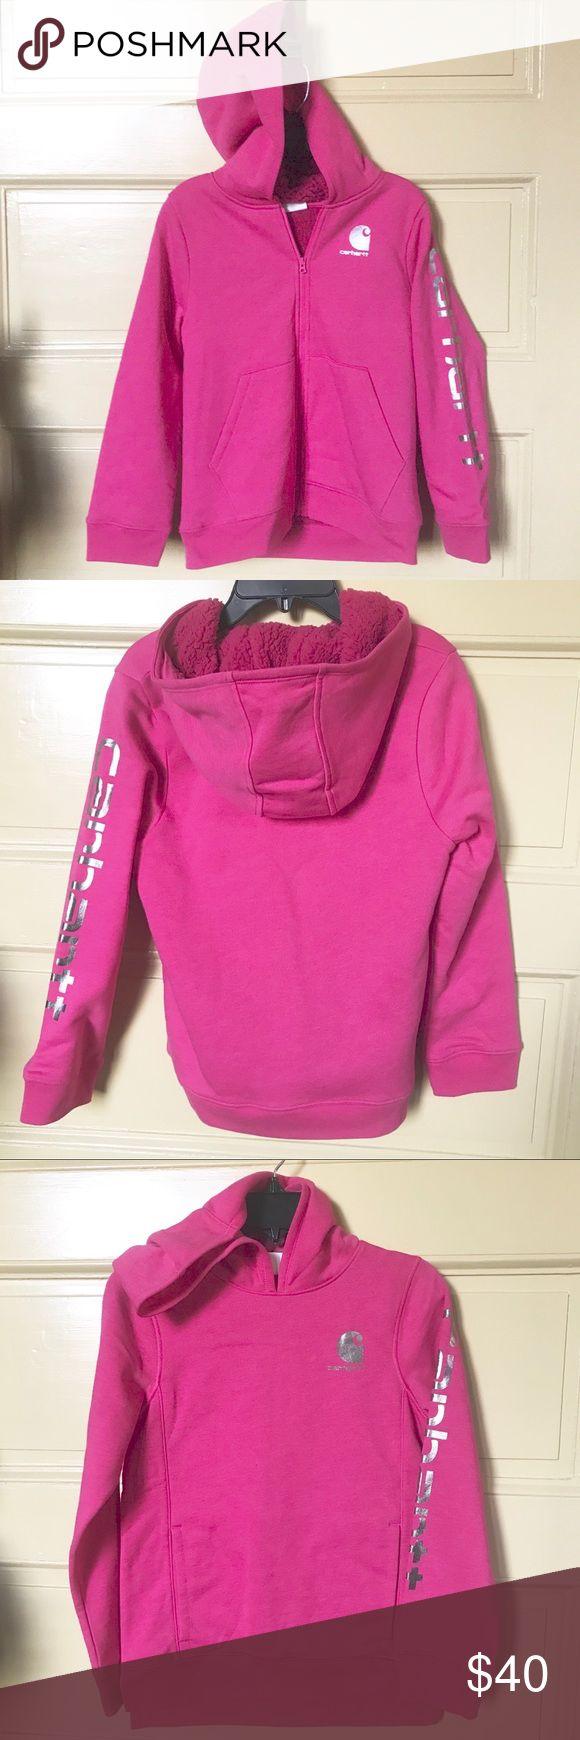 "Carhartt hot pink heather sherpa zip hoodie M NWOT Carhartt magenta hot pink heather sherpa zip hoodie M Chest 17"", Length 22"" Hooded fleece jacket w/sherpa lining & front pockets. Metallic silver left arm & chest silkscreen branding  Authorized-to-sell sales sample Smoke Free Home 🏠 Carhartt Shirts & Tops Sweatshirts & Hoodies"